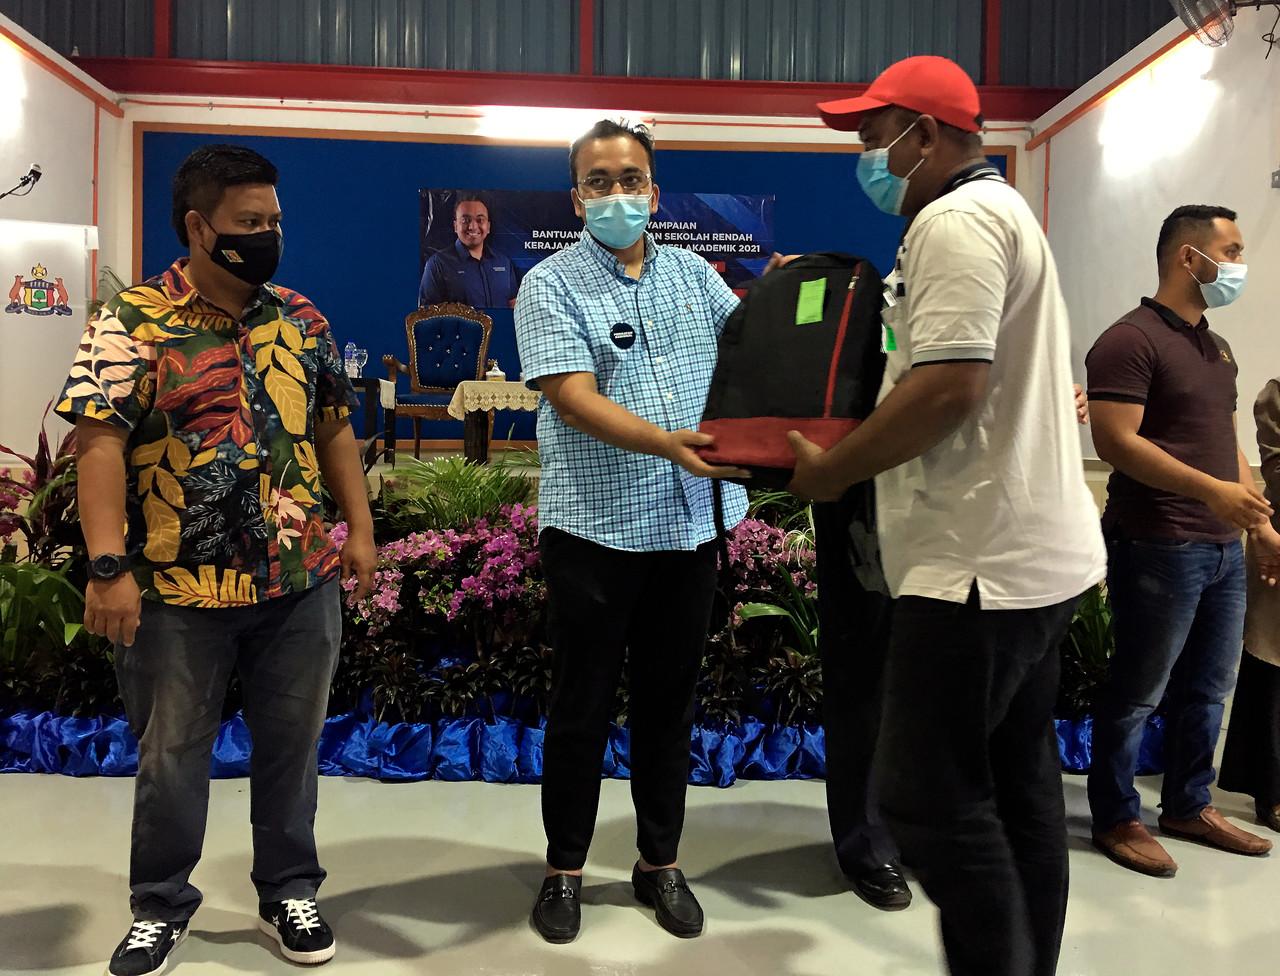 Datuk Mohd Rafiq Naizamohideen said the effort will focus on currently criticial areas. — Bernama pic